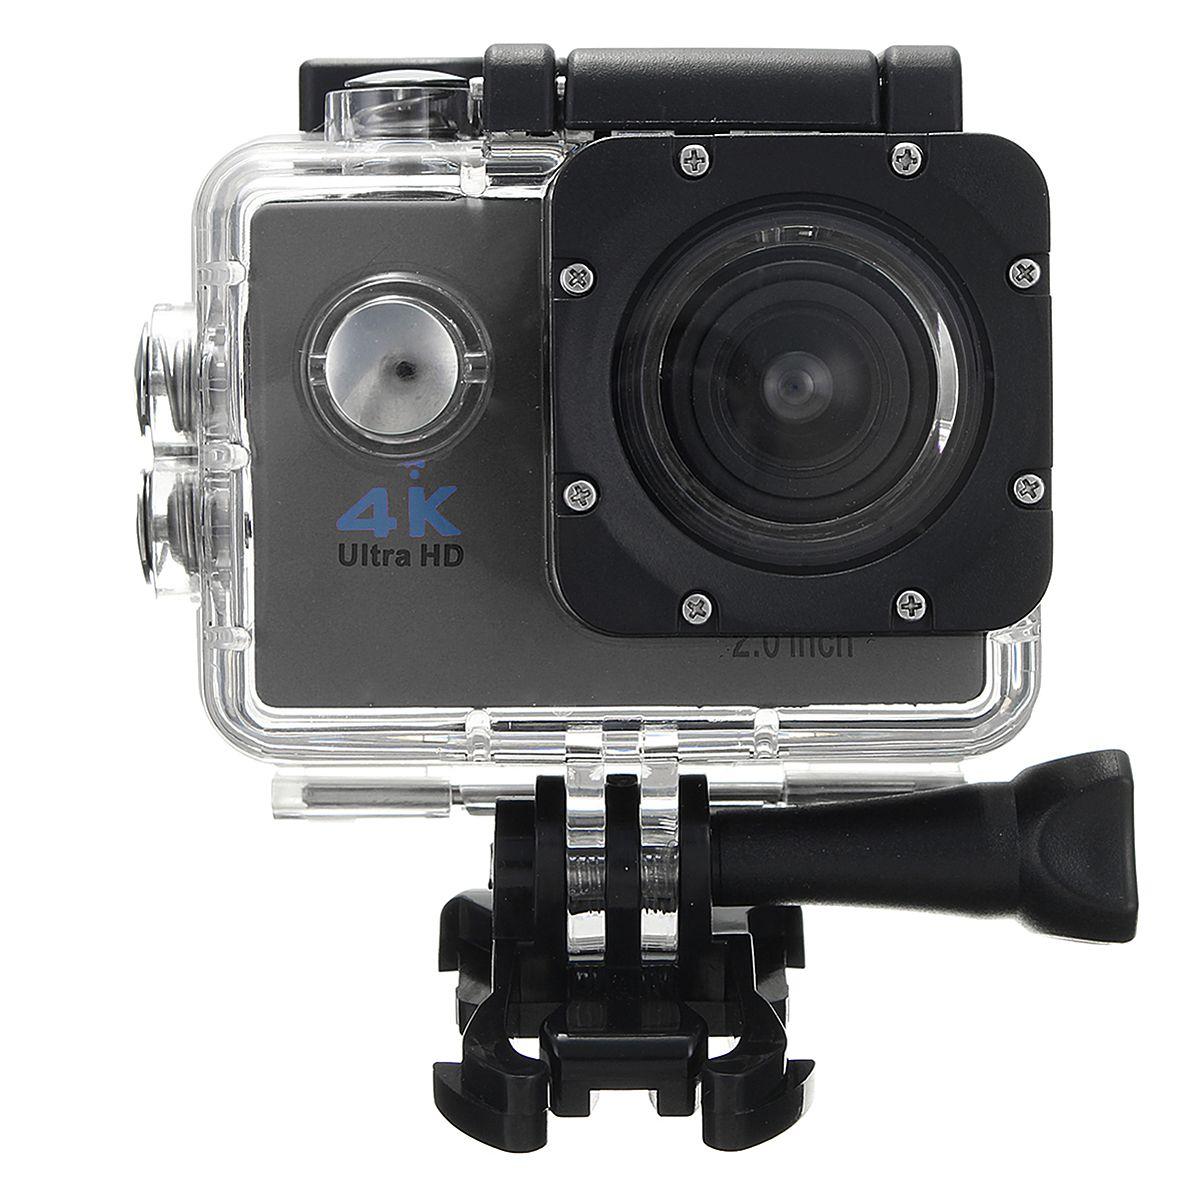 Sj9000r Hd 1080p Wifi Sport Dv Action Camera Camcorder With Remote Control Action Camera Camcorder Camera